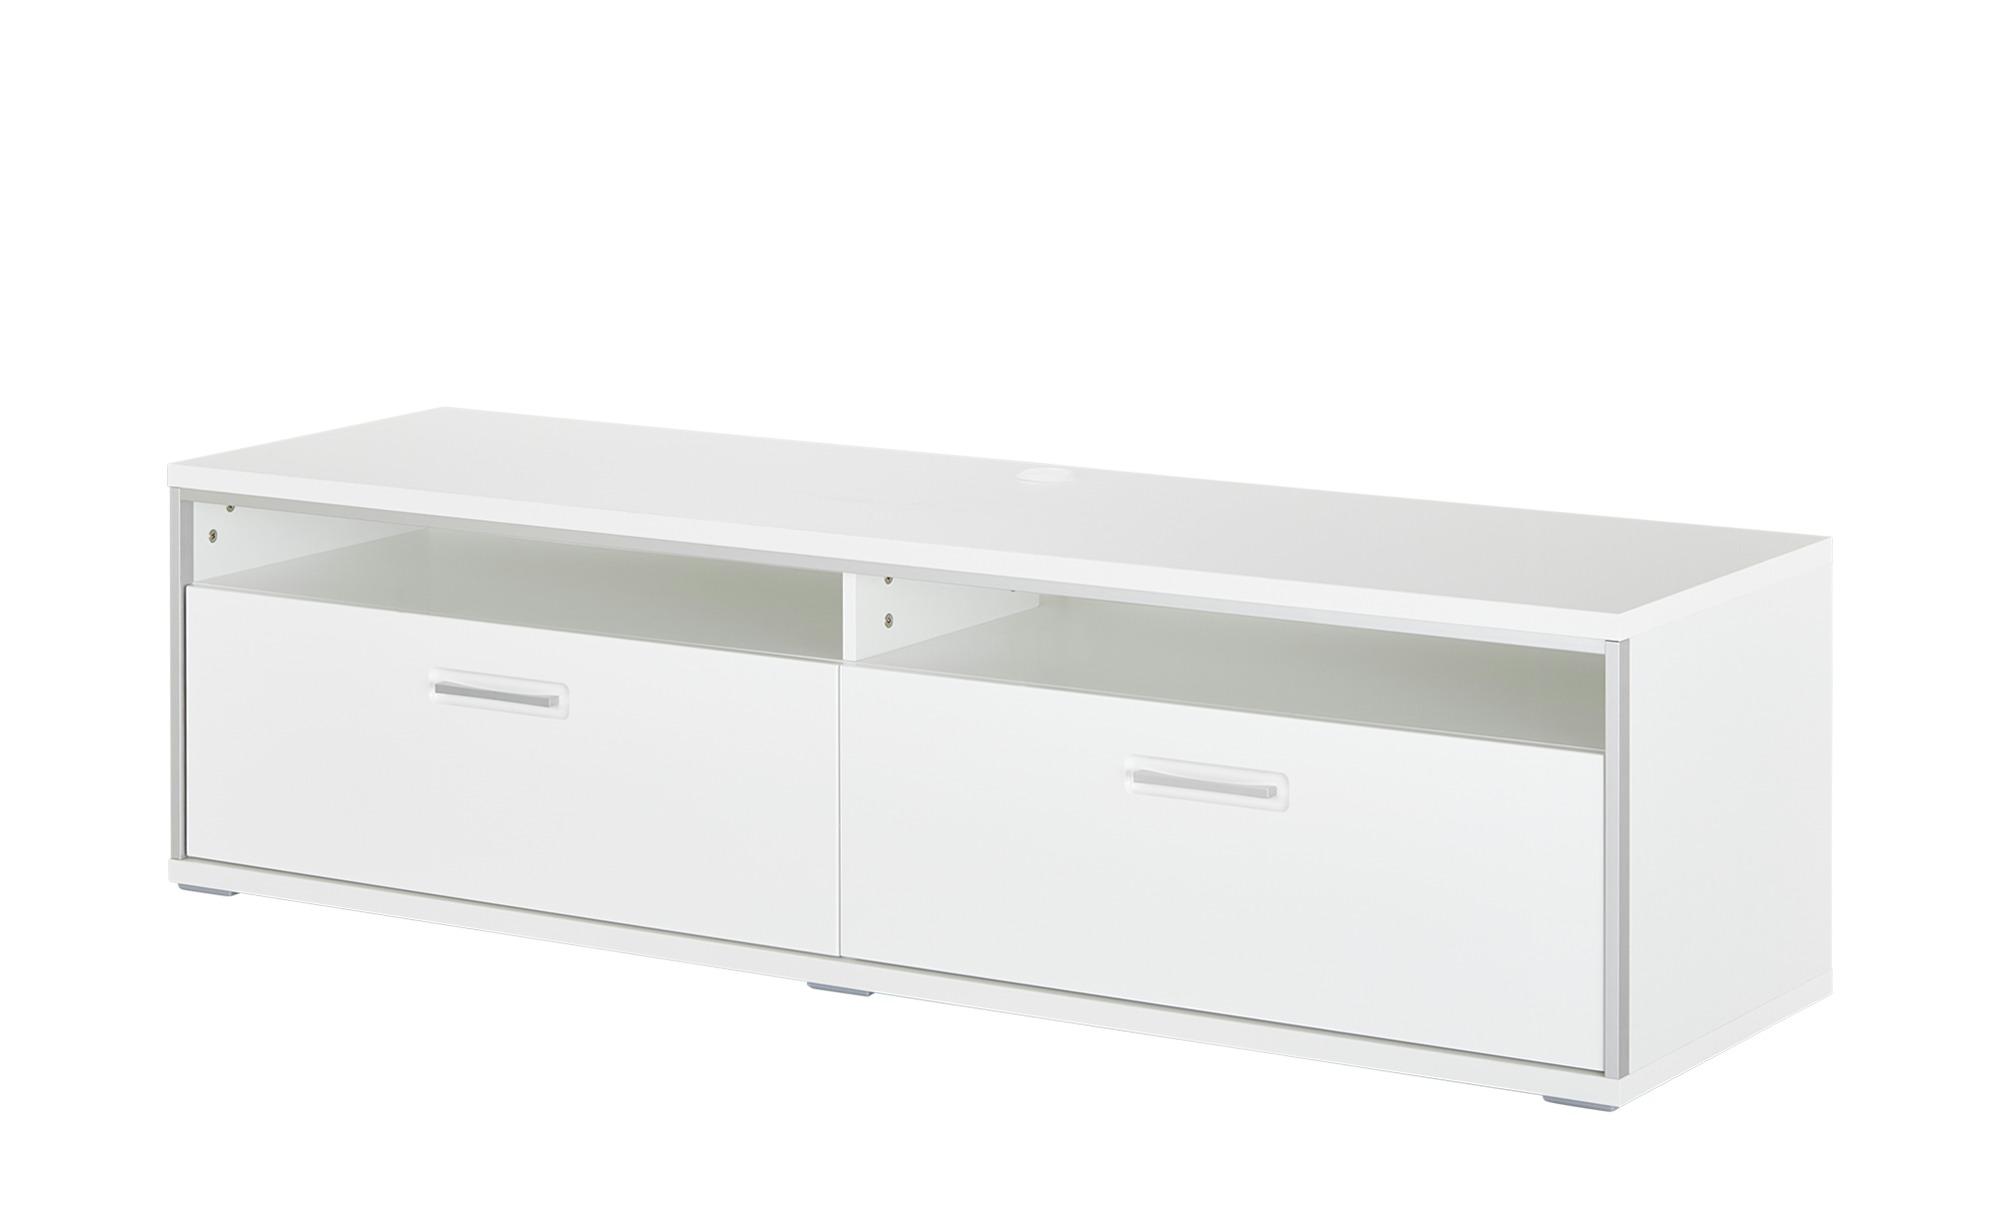 uno TV-Lowboard   Setto ¦ weiß ¦ Maße (cm): B: 184 H: 51 T: 51 Kommoden & Sideboards > Lowboards - Höffner